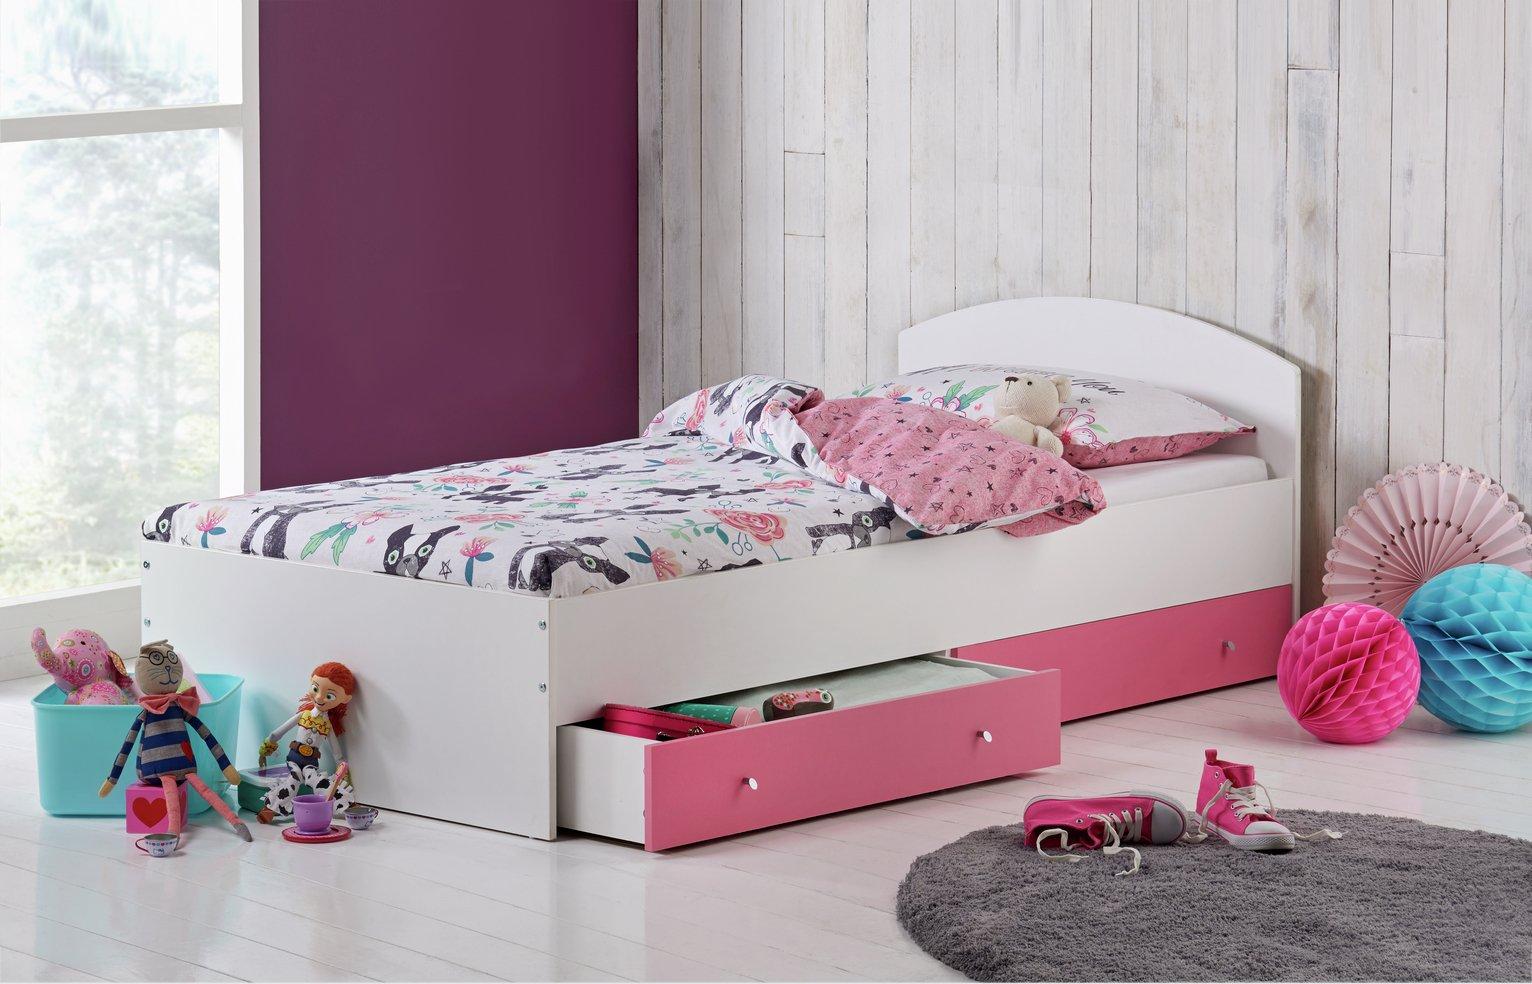 HOME Malibu Single Bed with Elliott Mattress - Pink & White.